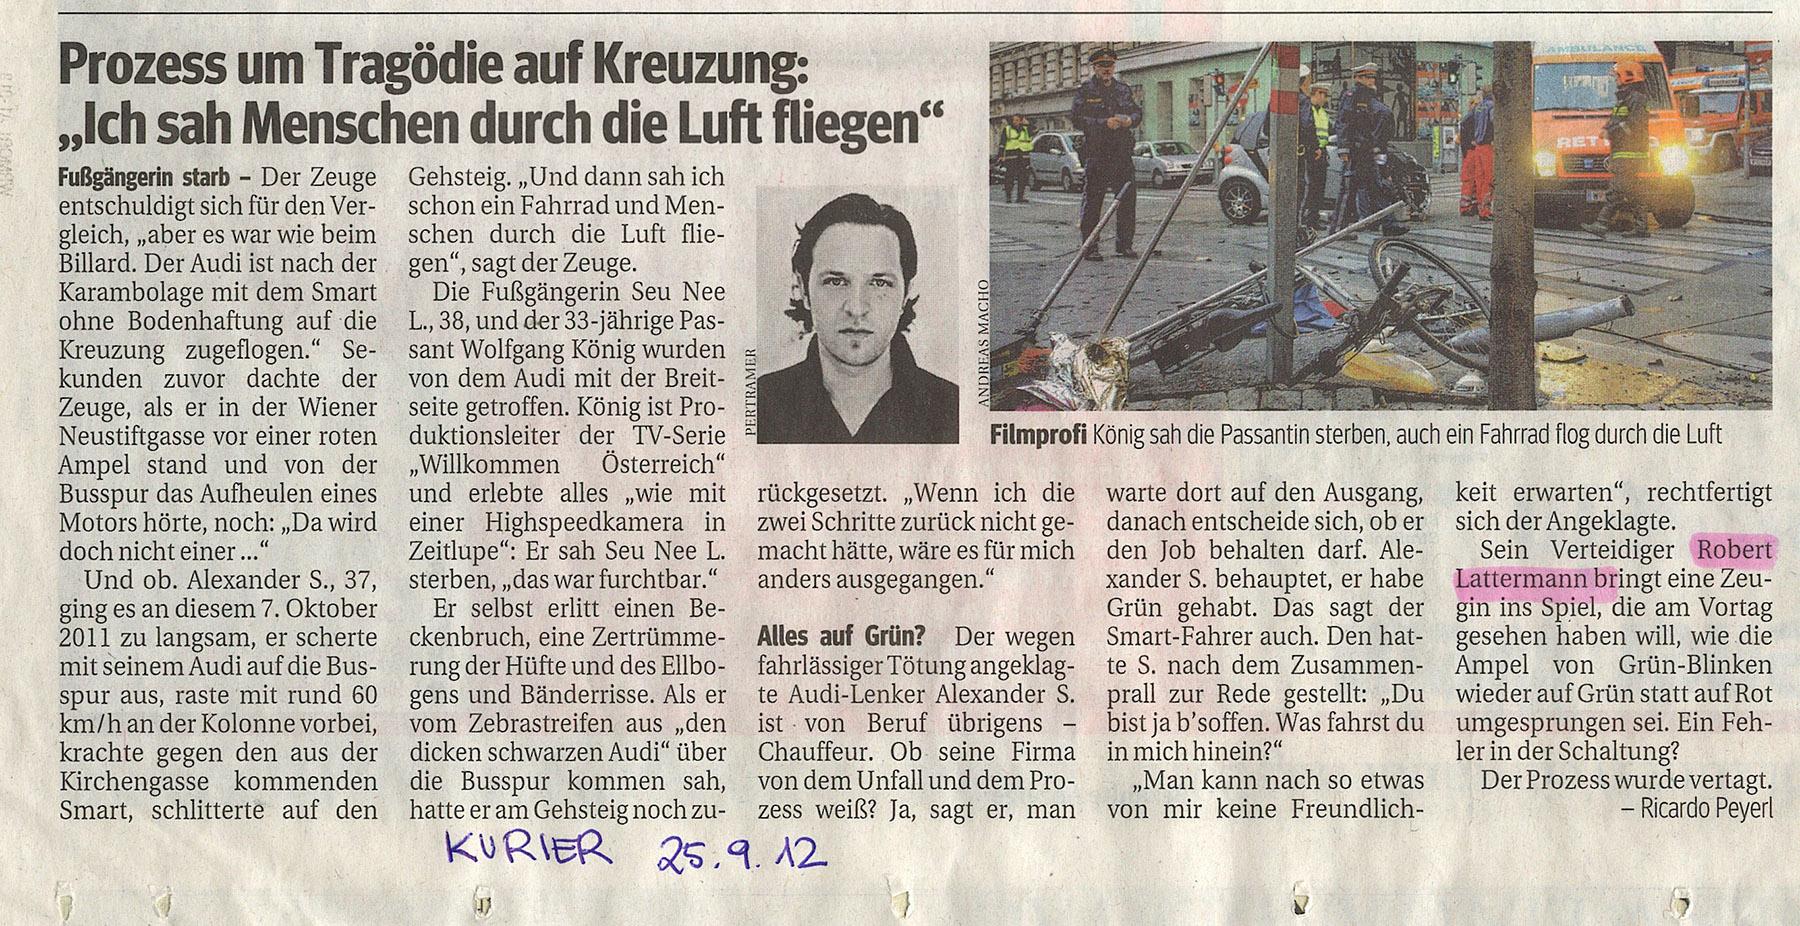 25. September 2012 © Kurier